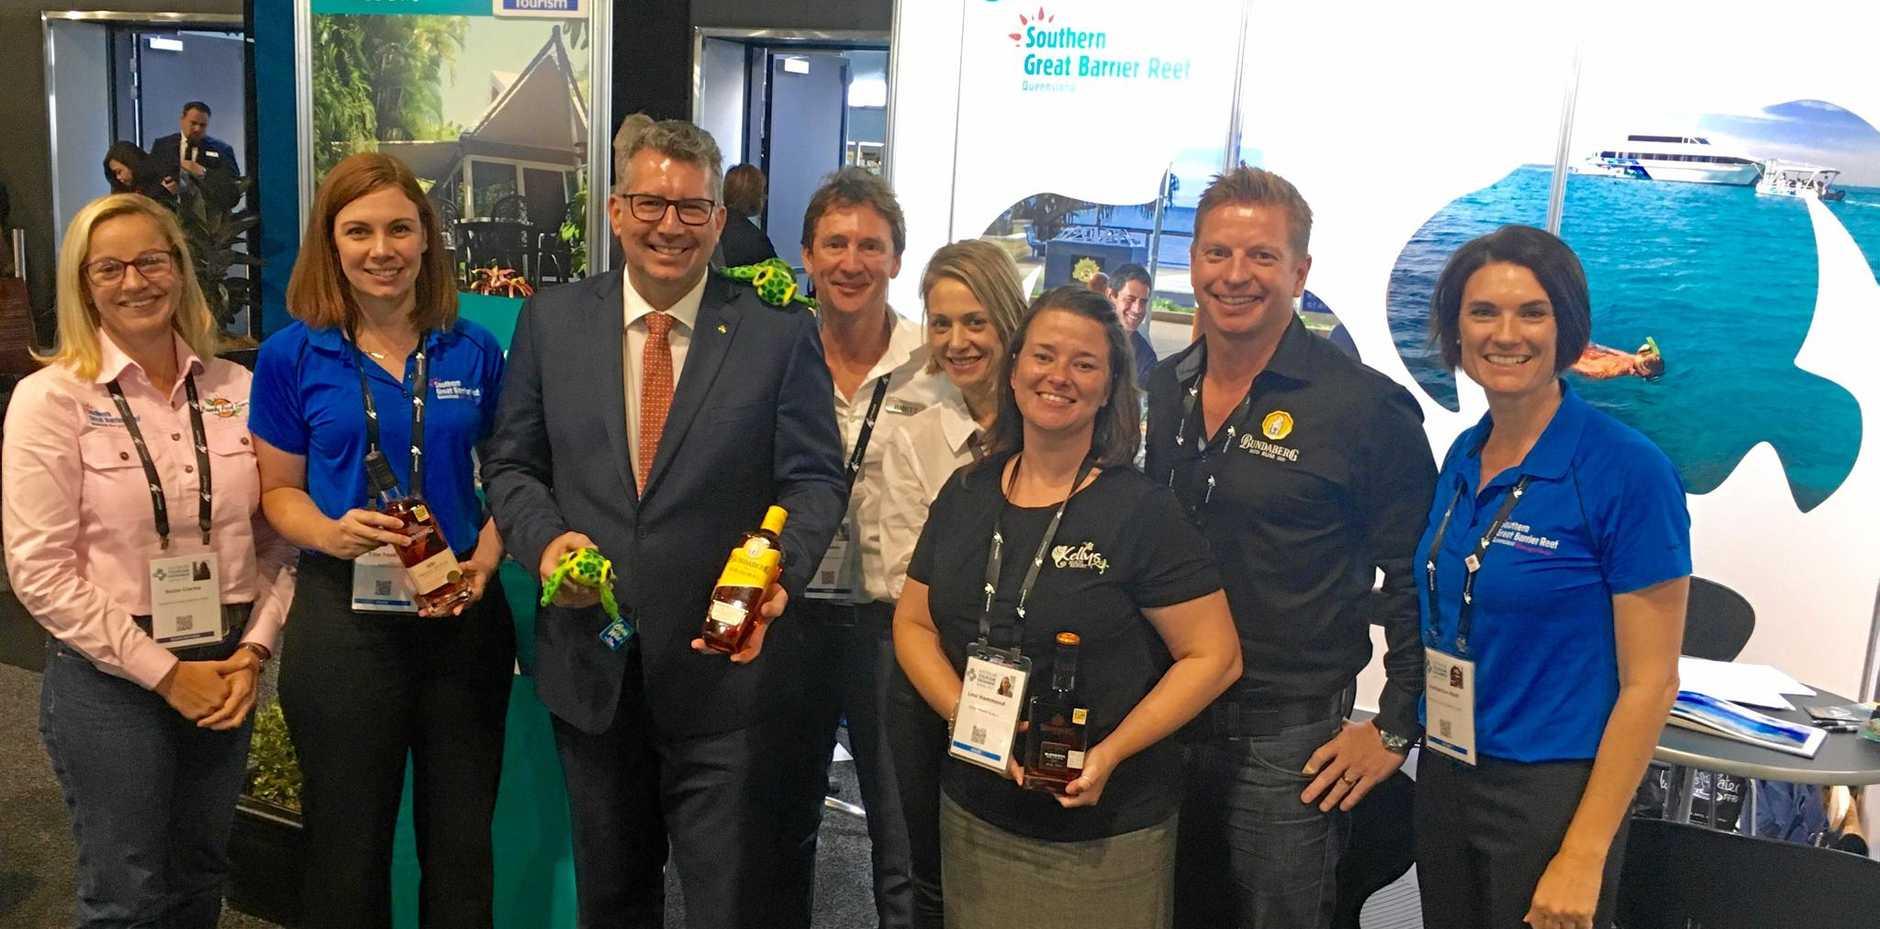 TEAM BUNDY: Suzie Clarke, Ellie Tonkin, Keith Pitt, Brett Lakey, Penny Morgan, Loni Hammond, Duncan Littler and Katherine Reid at the Australian Tourism Exchange today.